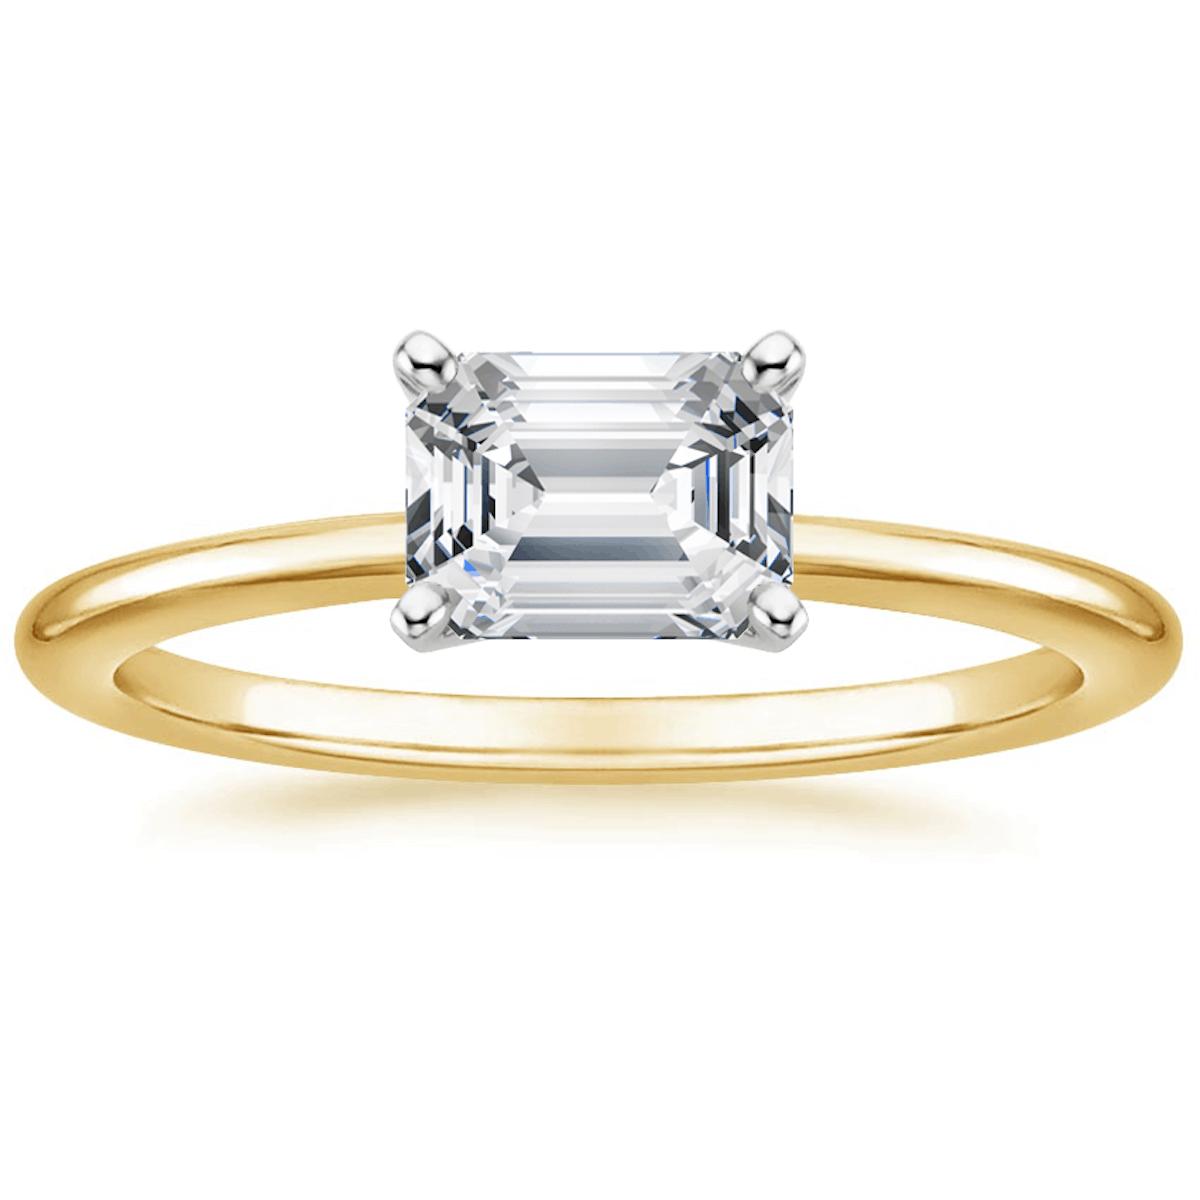 18K Yellow Gold Horizontal Petite Comfort Fit Engagement Ring